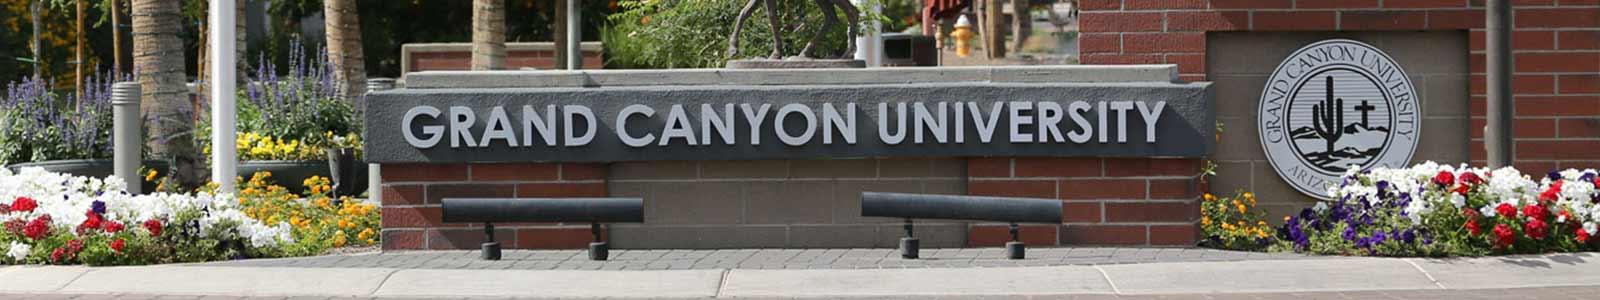 Academic Policies & Accreditations | Grand Canyon University